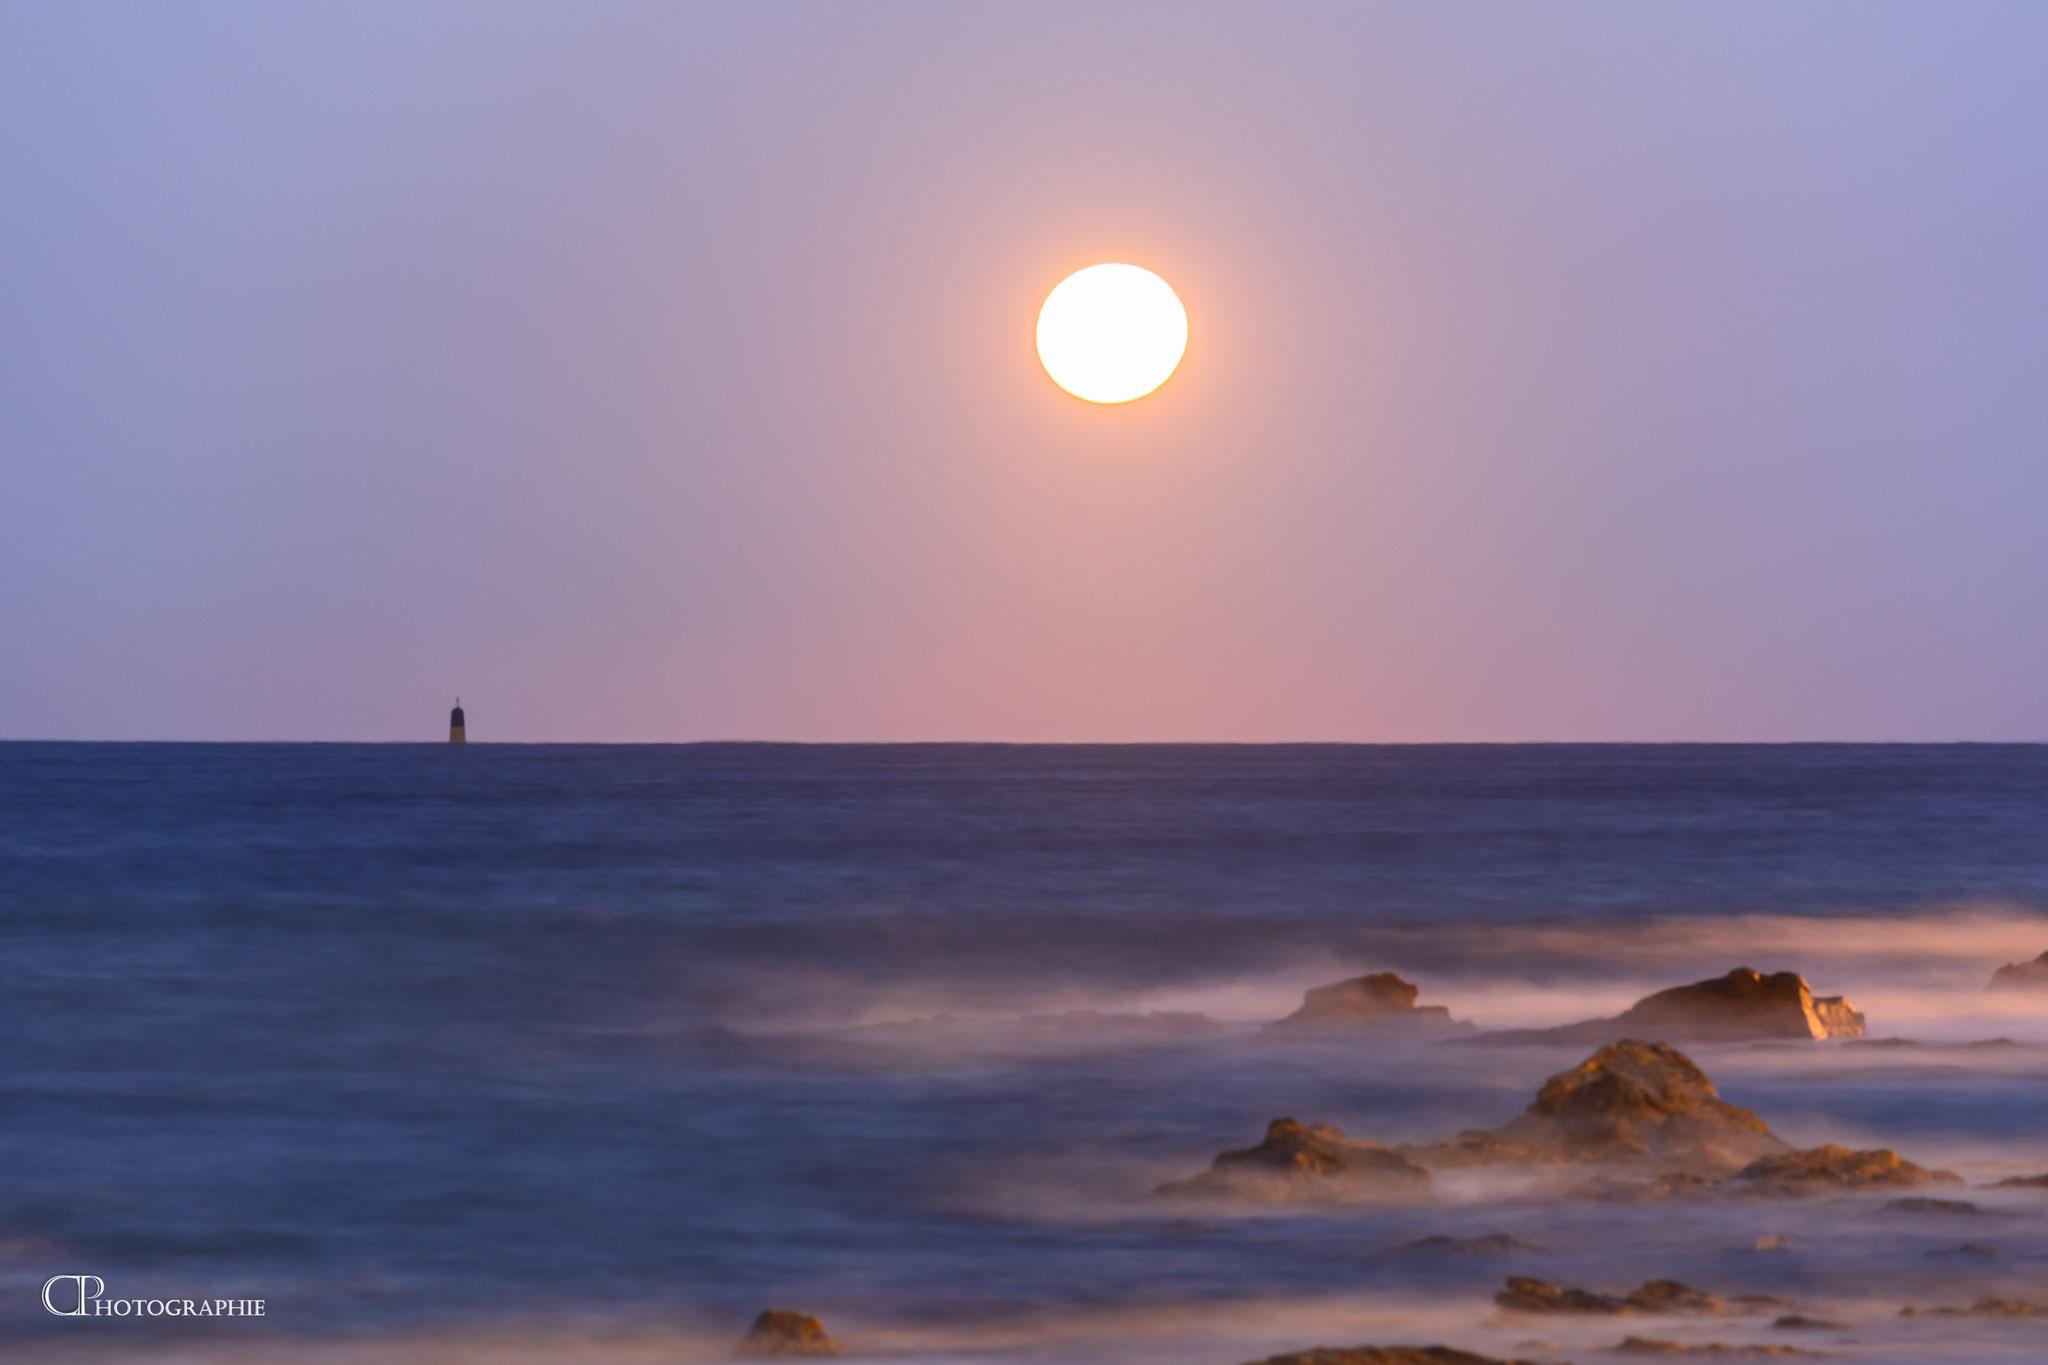 Lune solaire - Photo 3